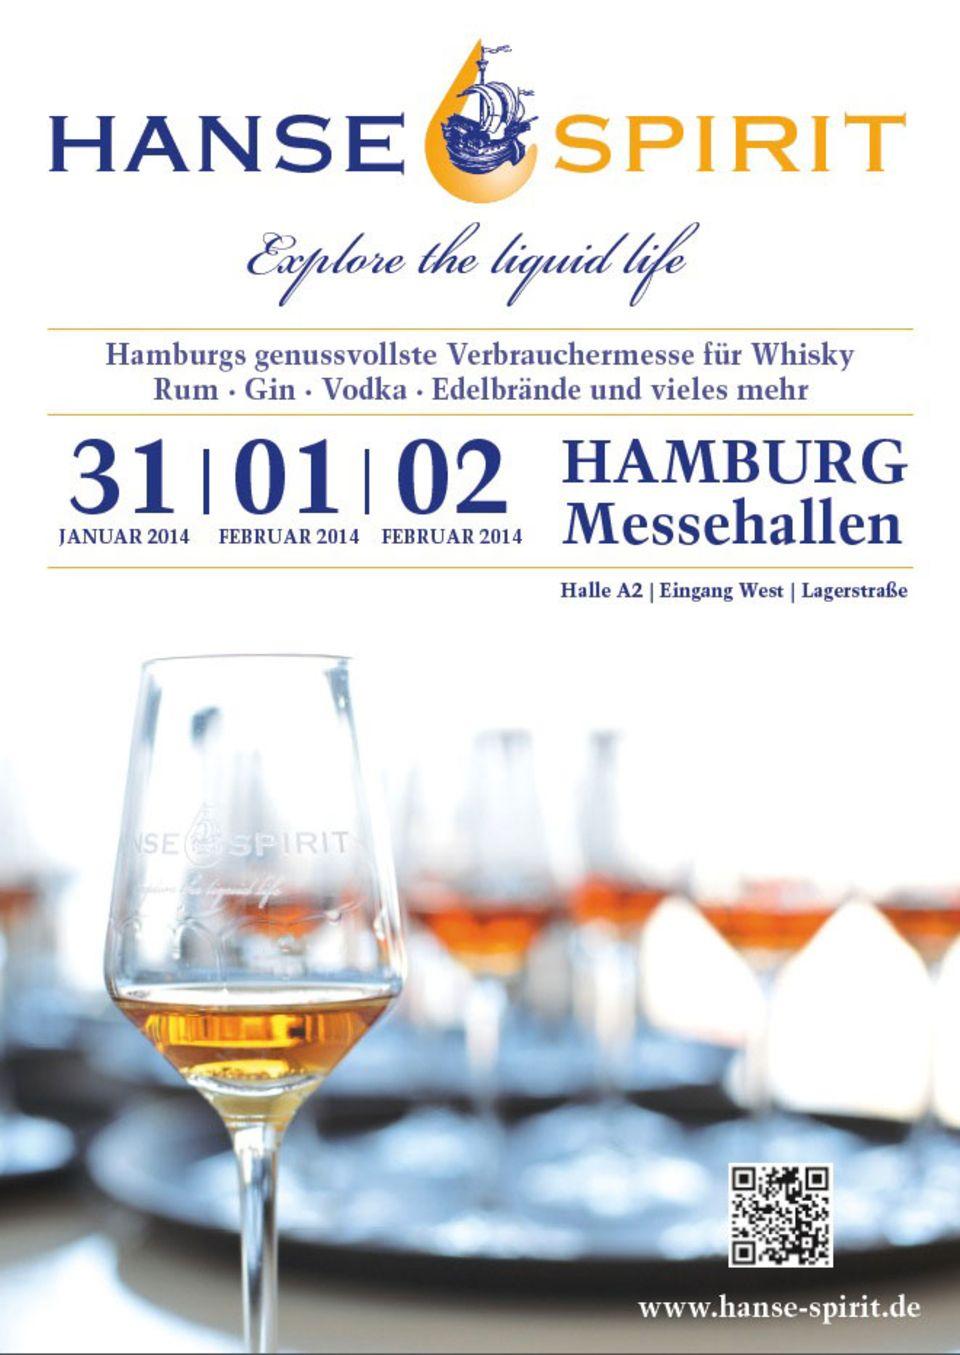 Barkultur in Hamburg: Hanse Spirit 2014